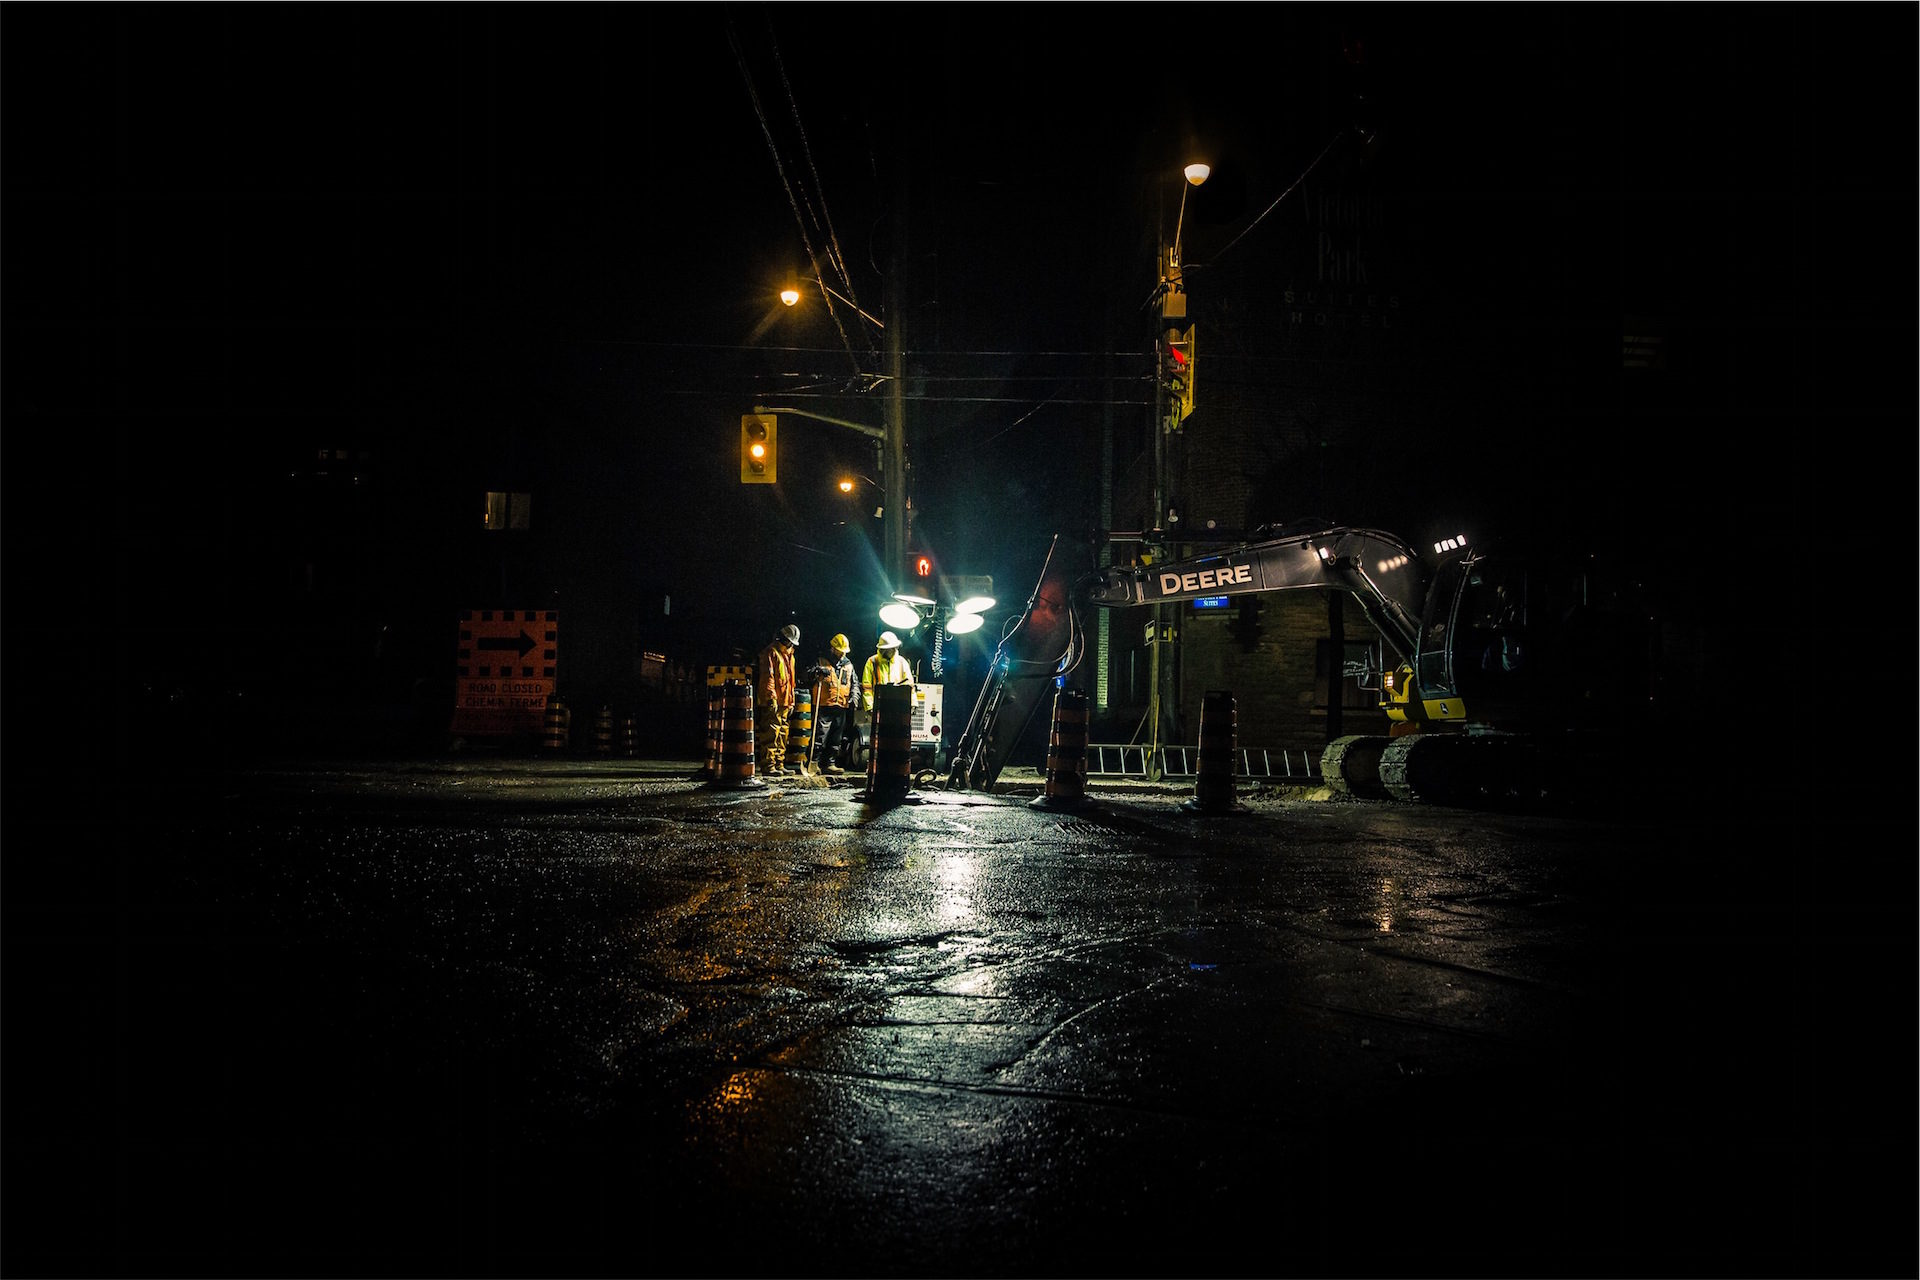 晚上, trabajadores, 维护, semáforos, mientras duermes - 高清壁纸 - 教授-falken.com